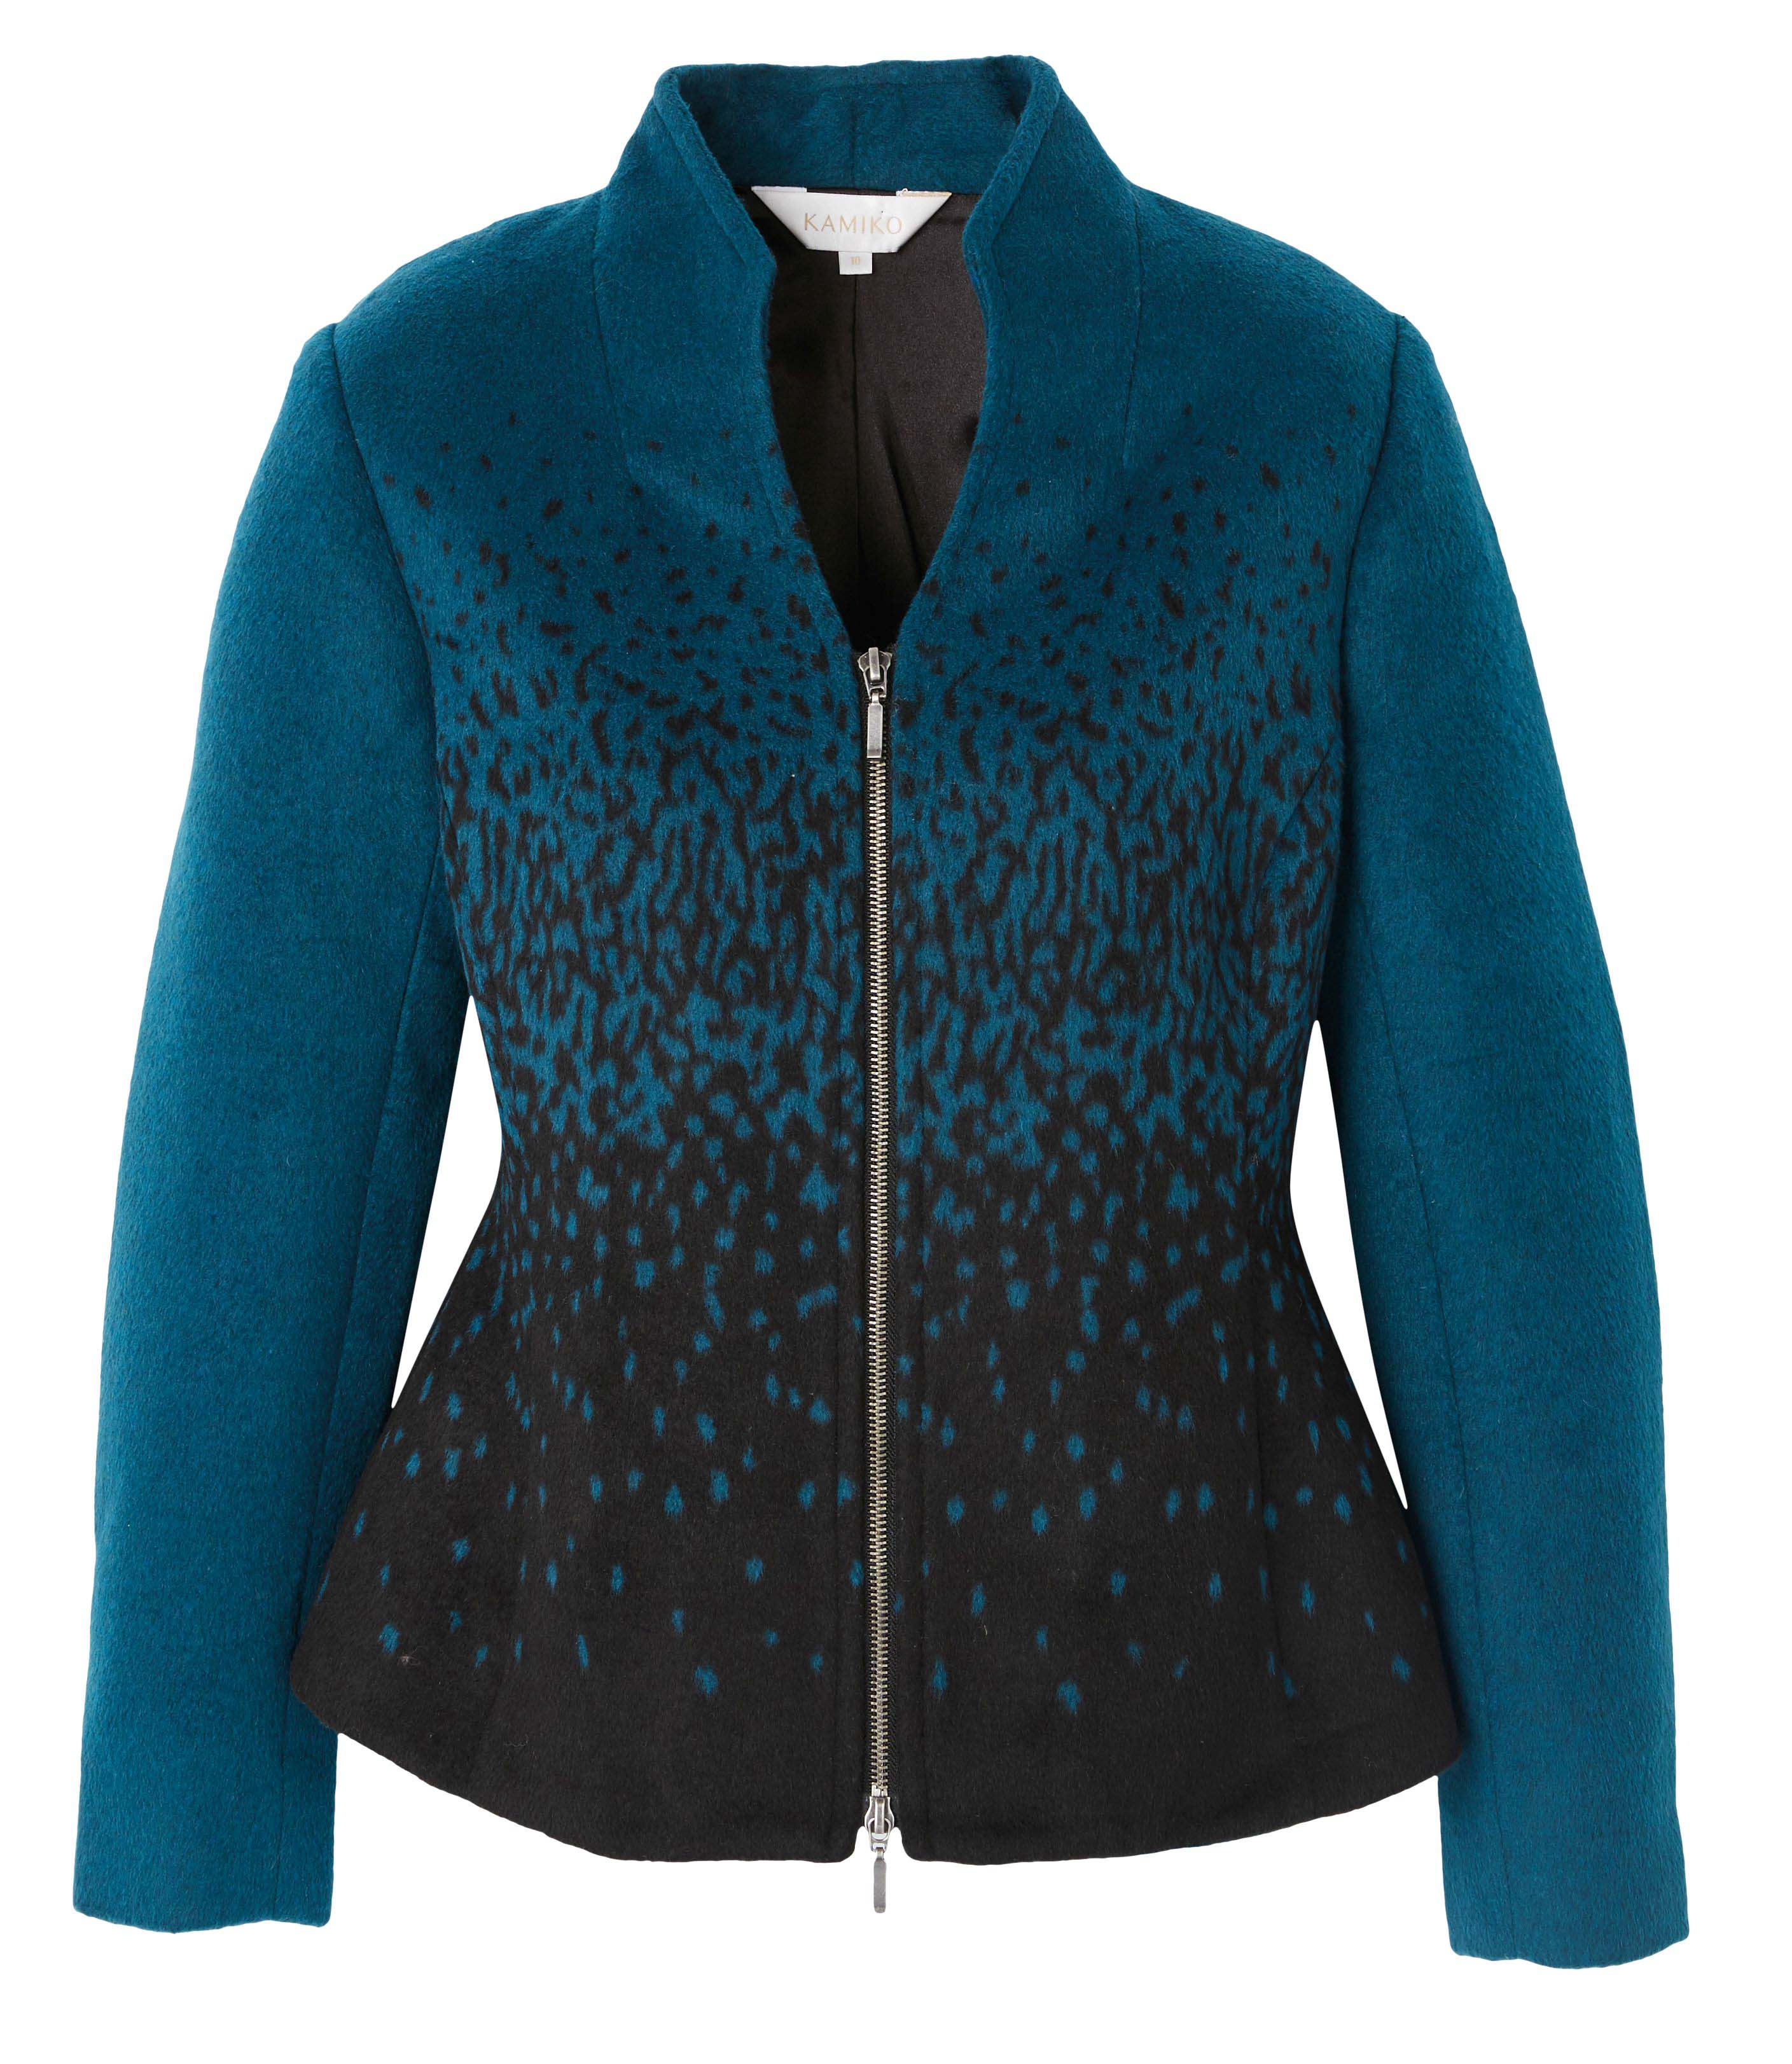 6092612 Kamiko Gradient Melton Jacket $189.99 Instore 1 Mar 2016